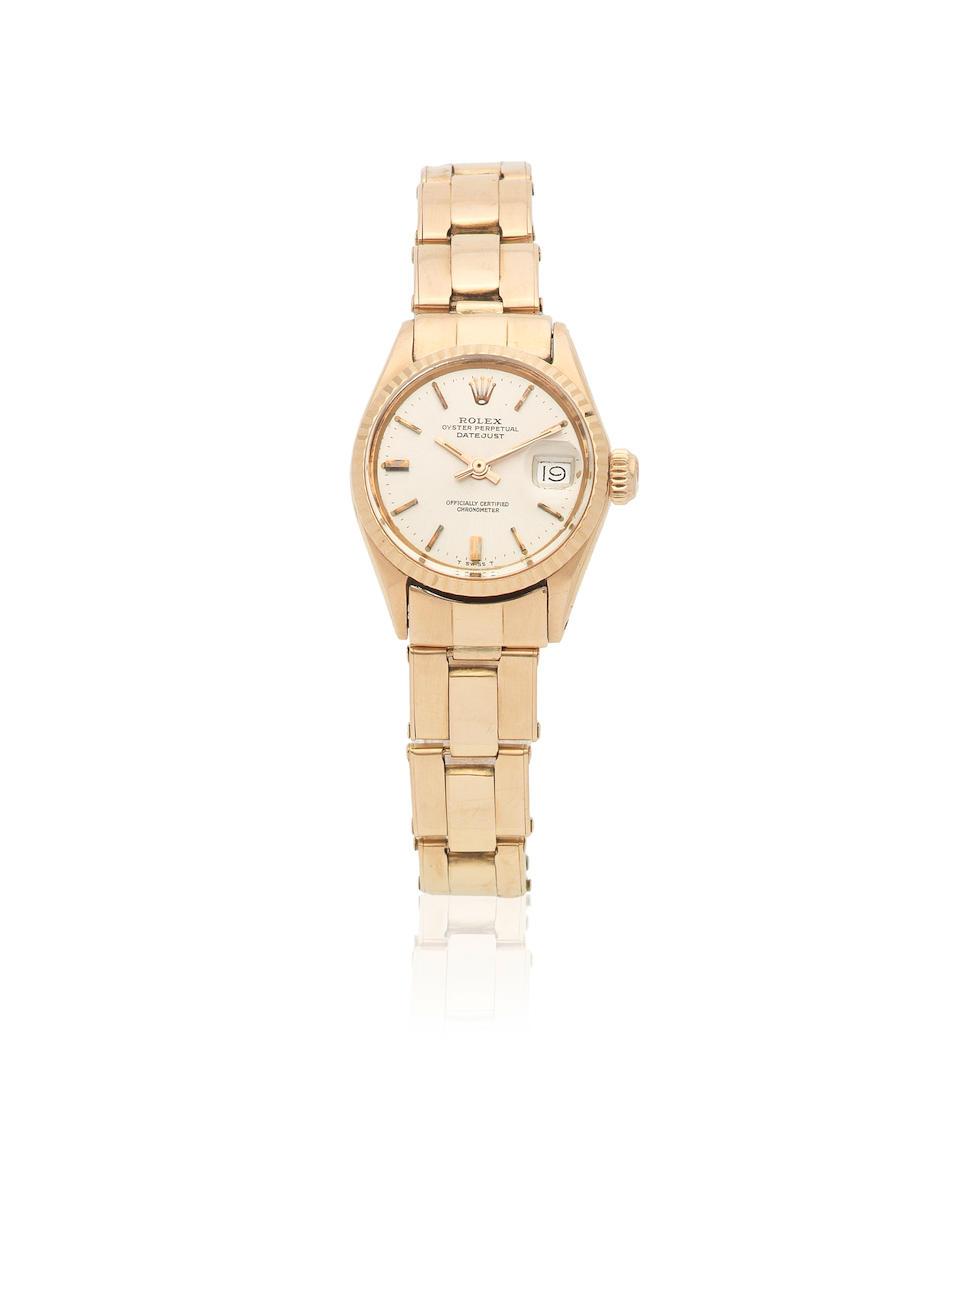 Rolex. A lady's 18K rose gold automatic bracelet watch  Datejust, Ref: 6517, Circa 1963